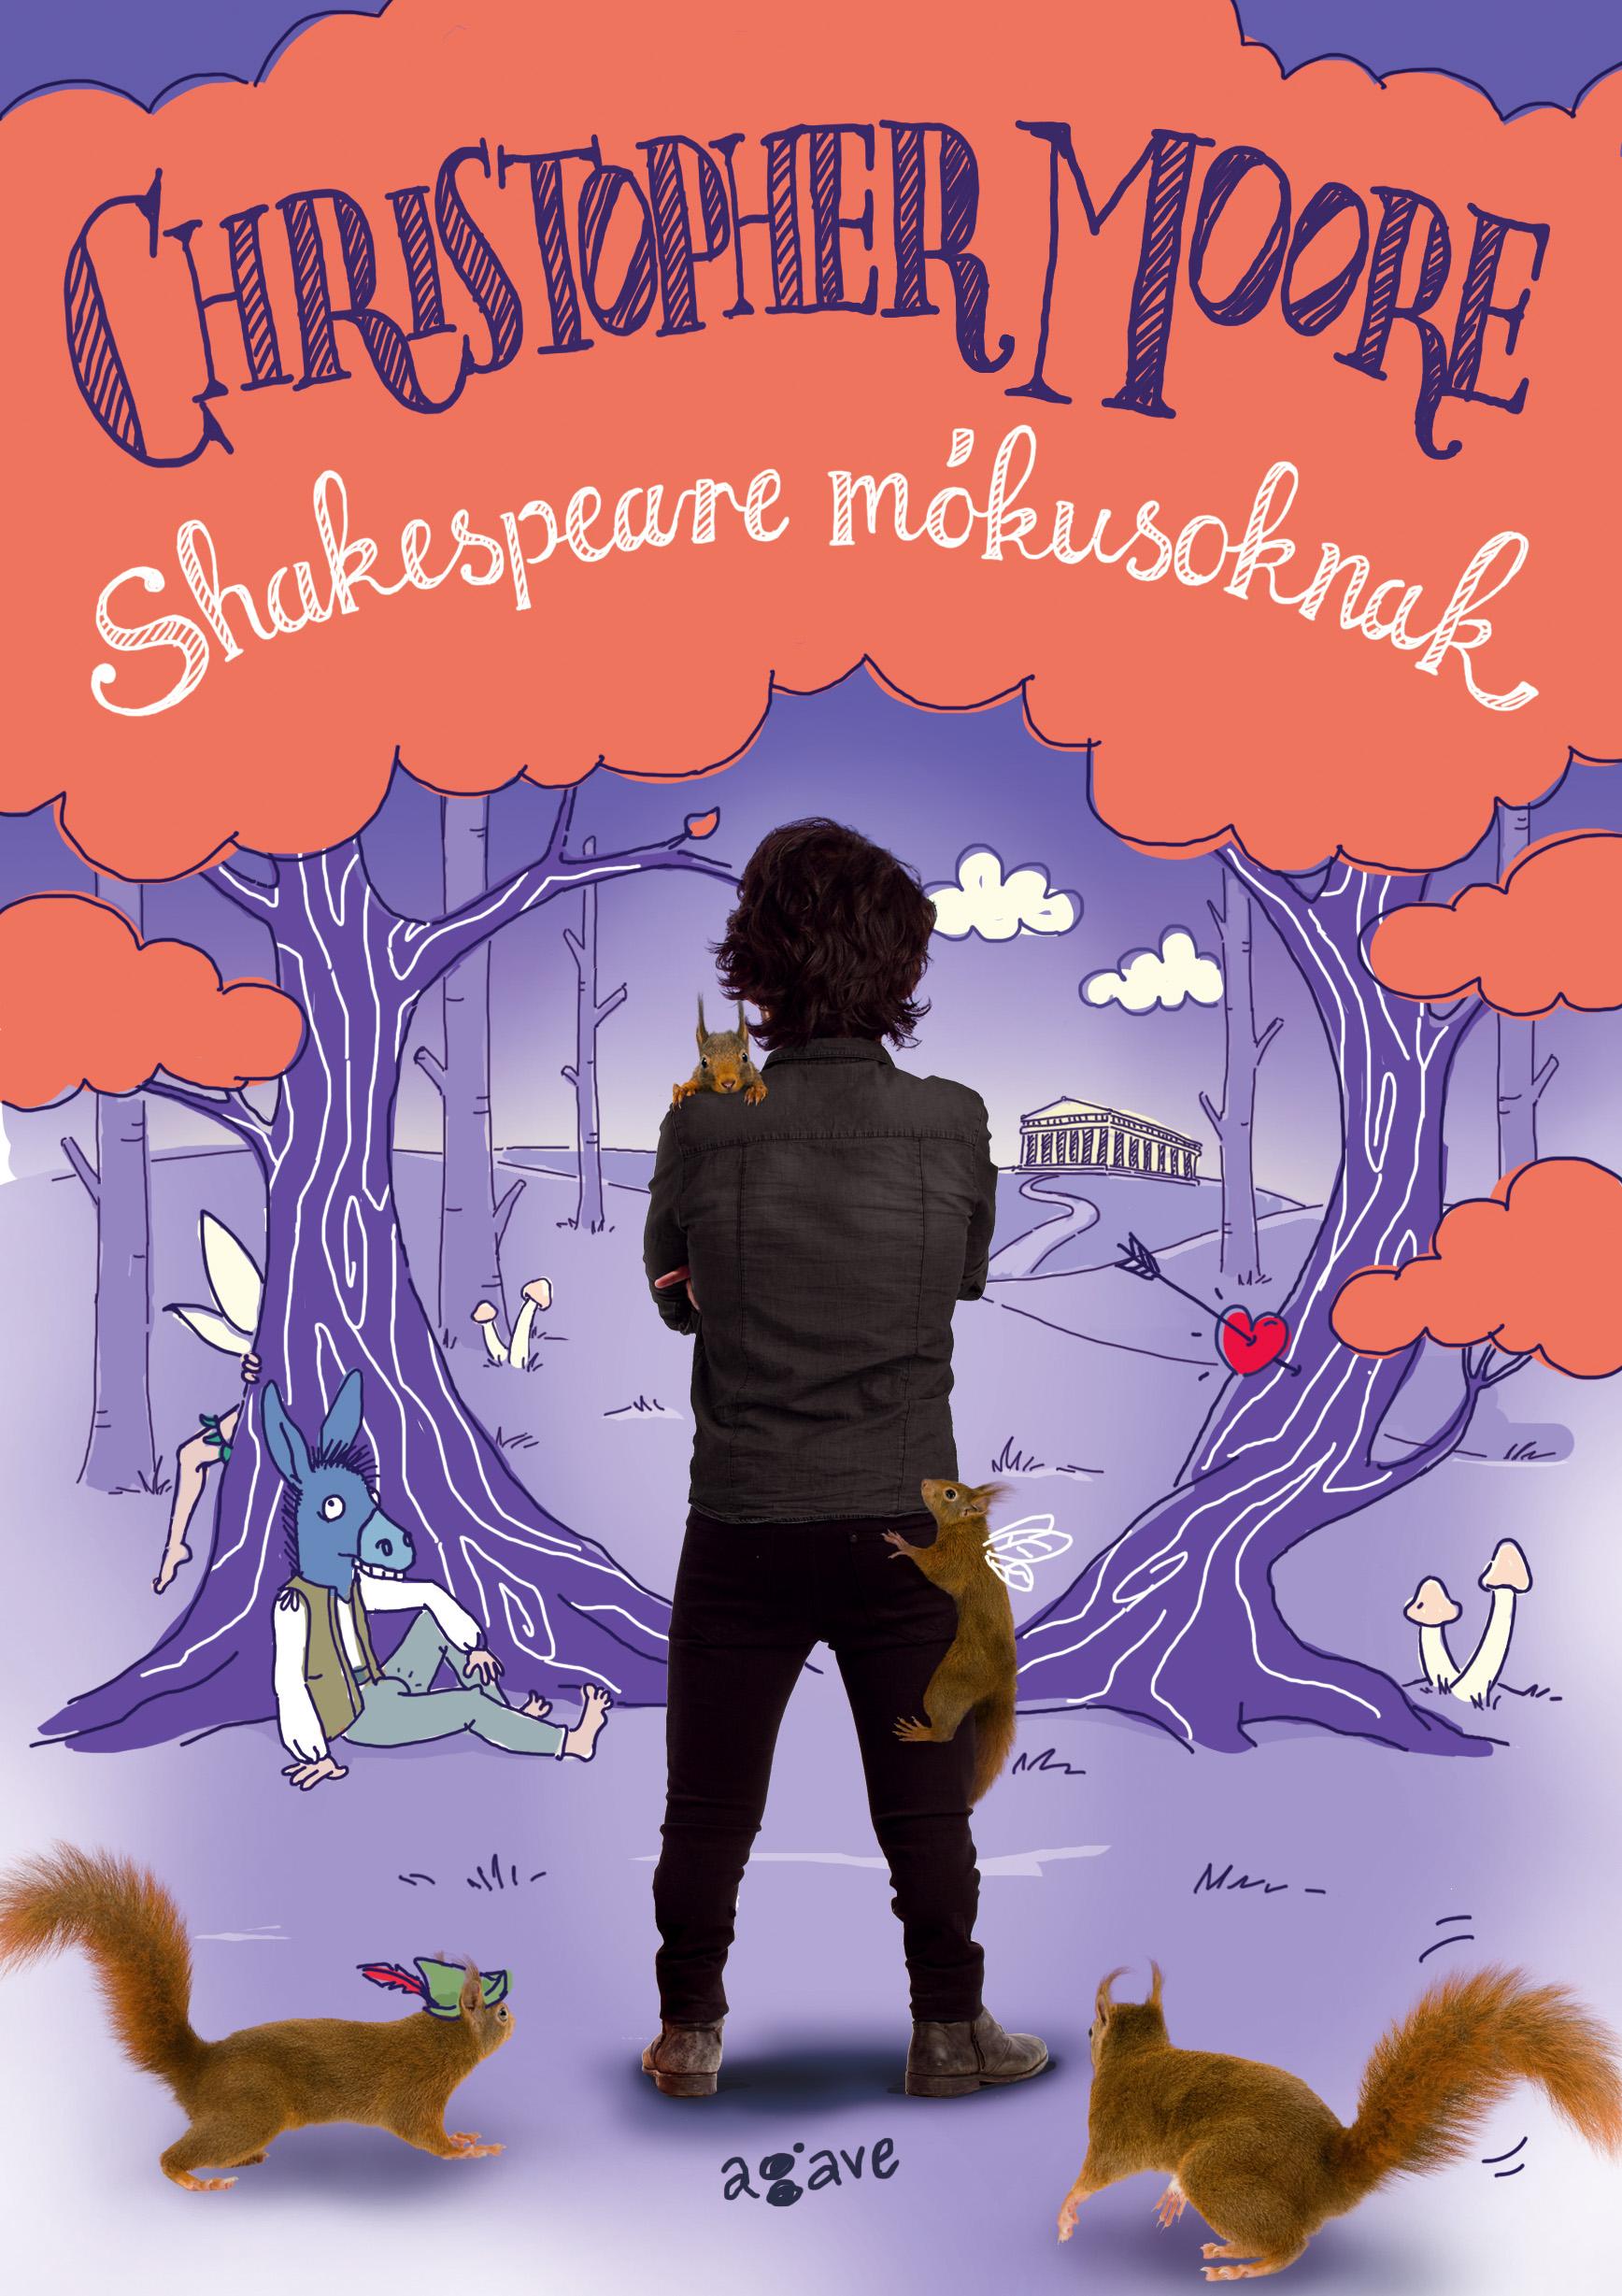 Shakespeare mókusoknak